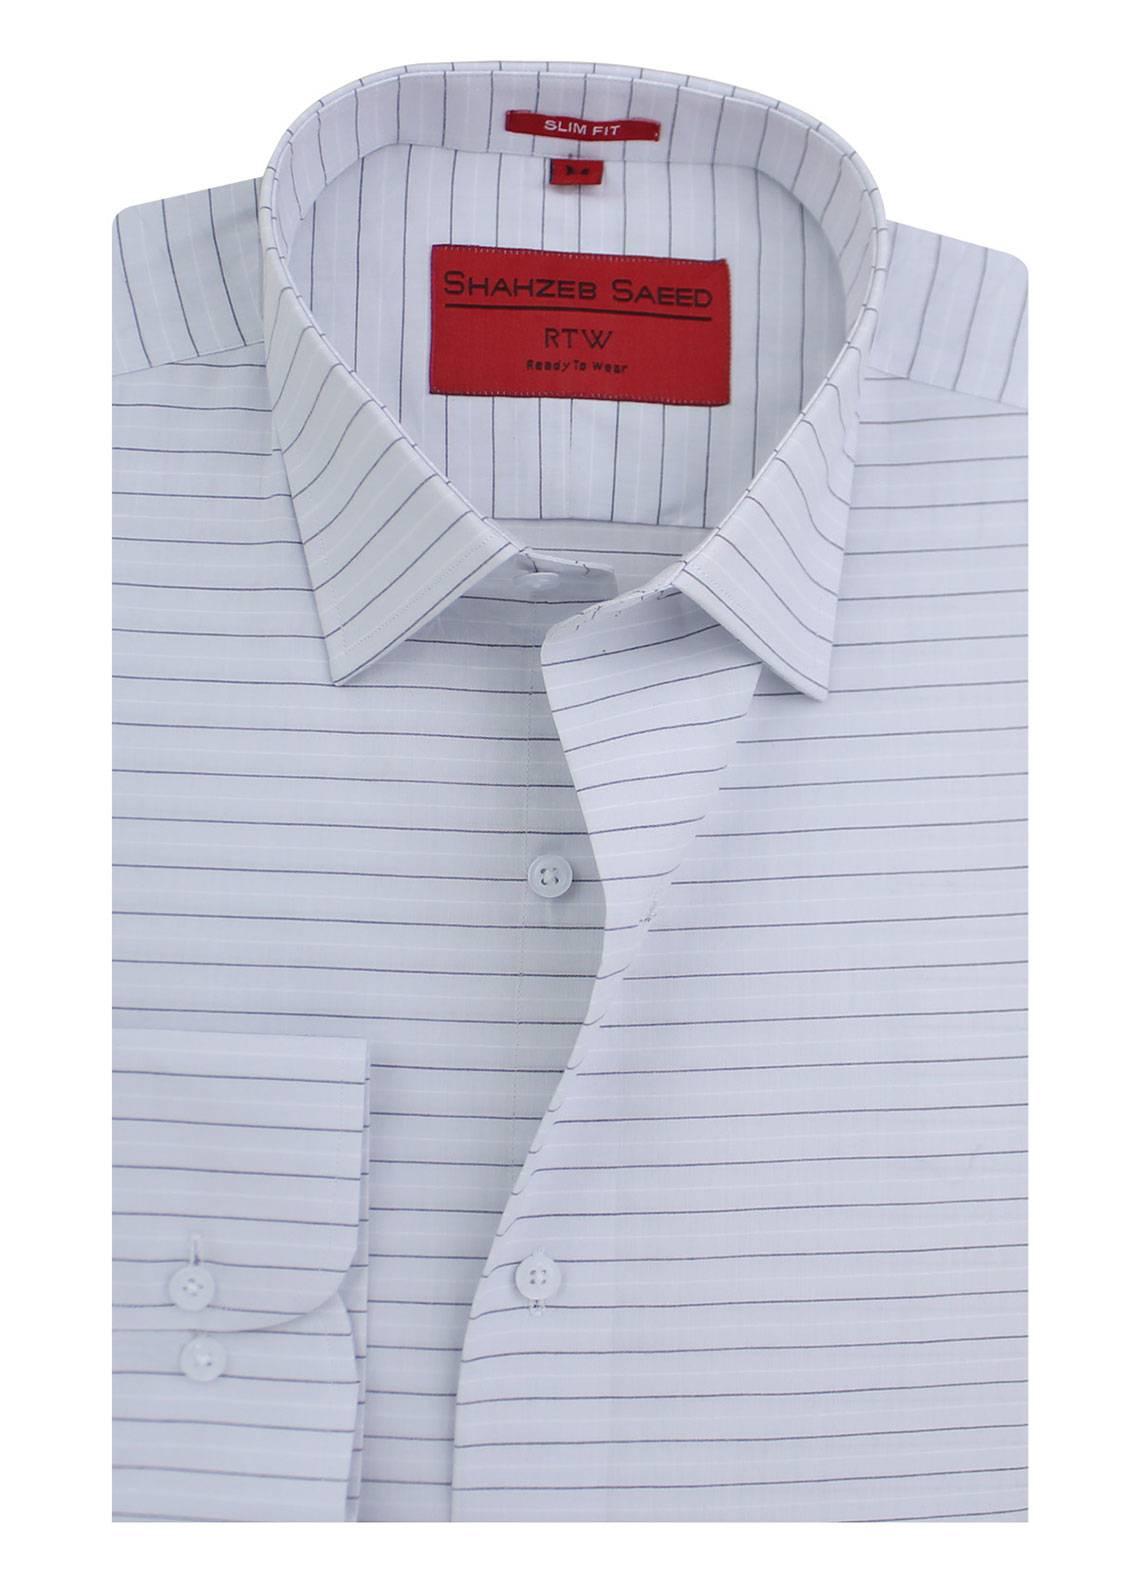 Shahzeb Saeed Cotton Formal Shirts for Men - Blue RTW-1350